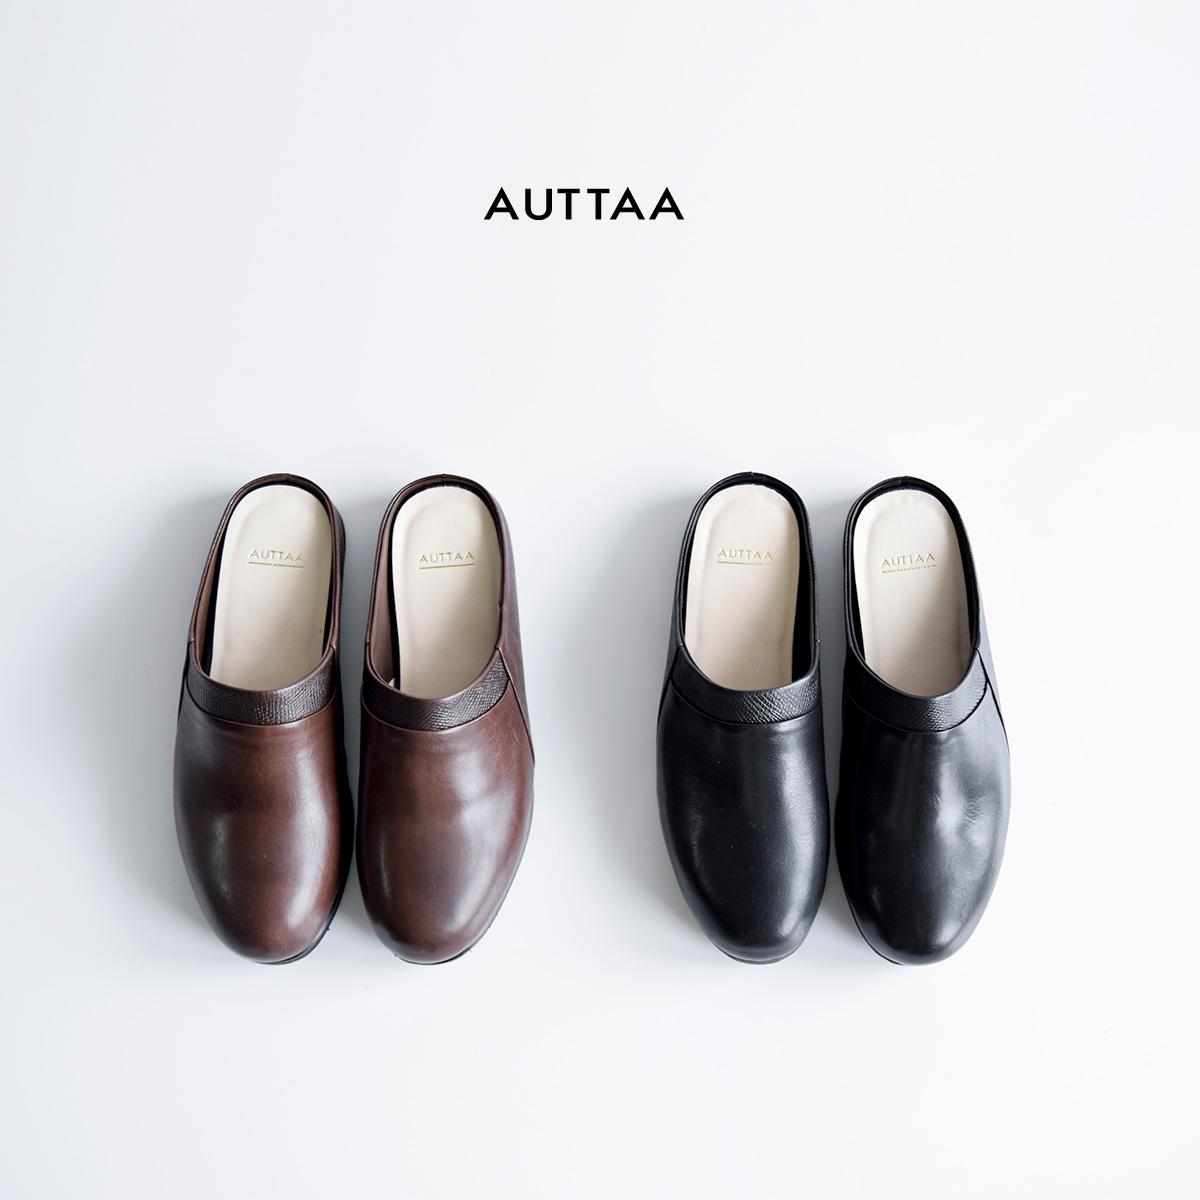 "AUTTAA(アウッタ)ナッパレザースリッパルームシューズ""Room Shoes III"" room-shoes3"